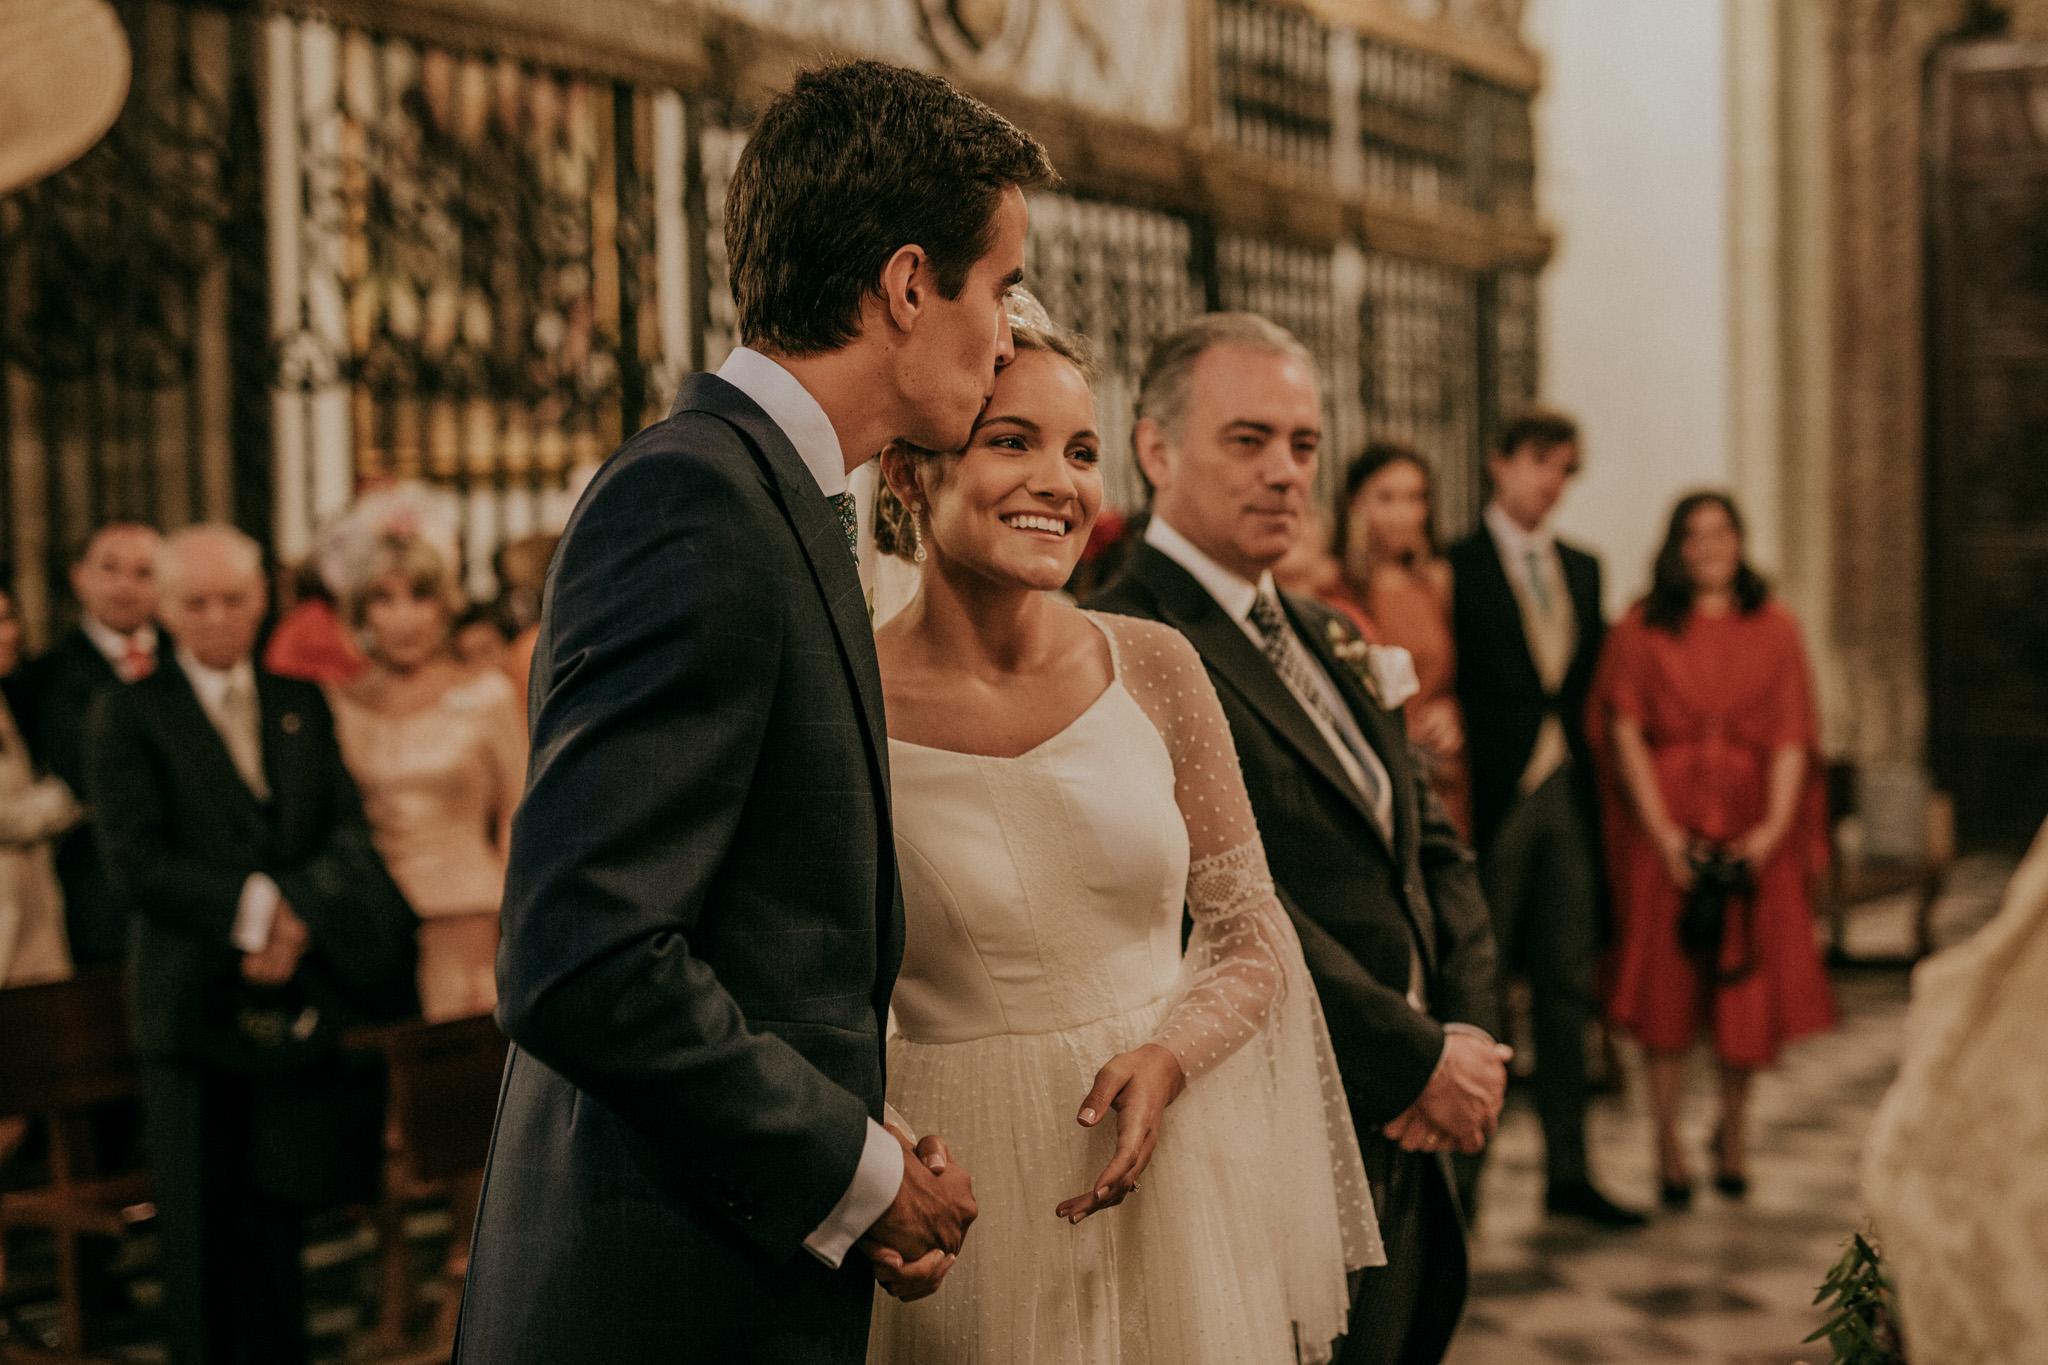 fotografia-boda-wedding-photographer-spain-concorazon-132